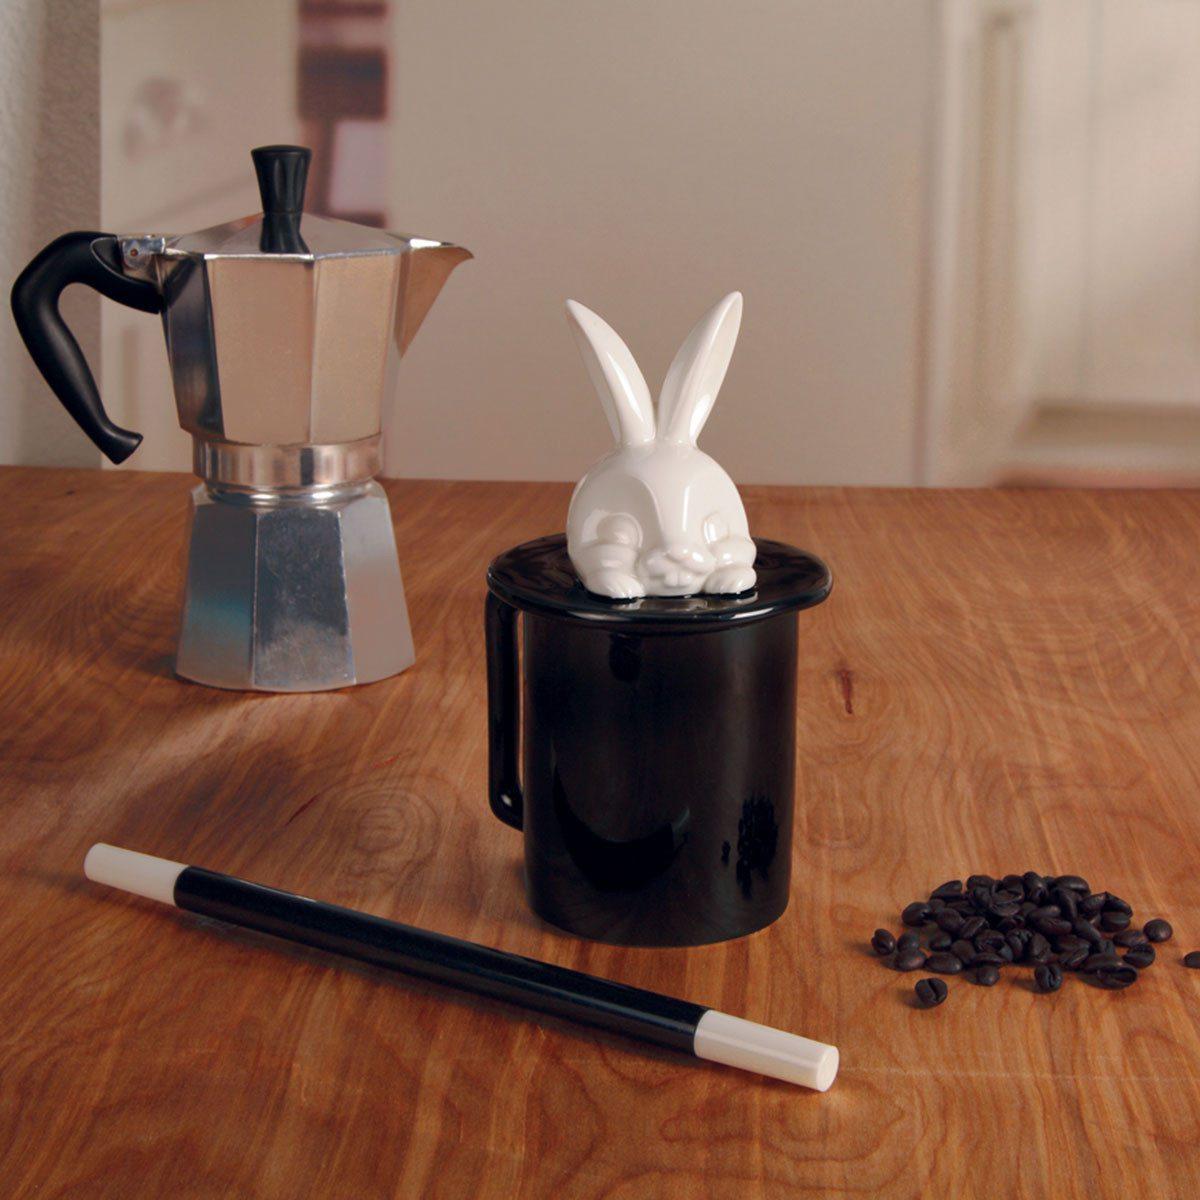 Taza potagia - Un desayuno solo para ilusionsitas